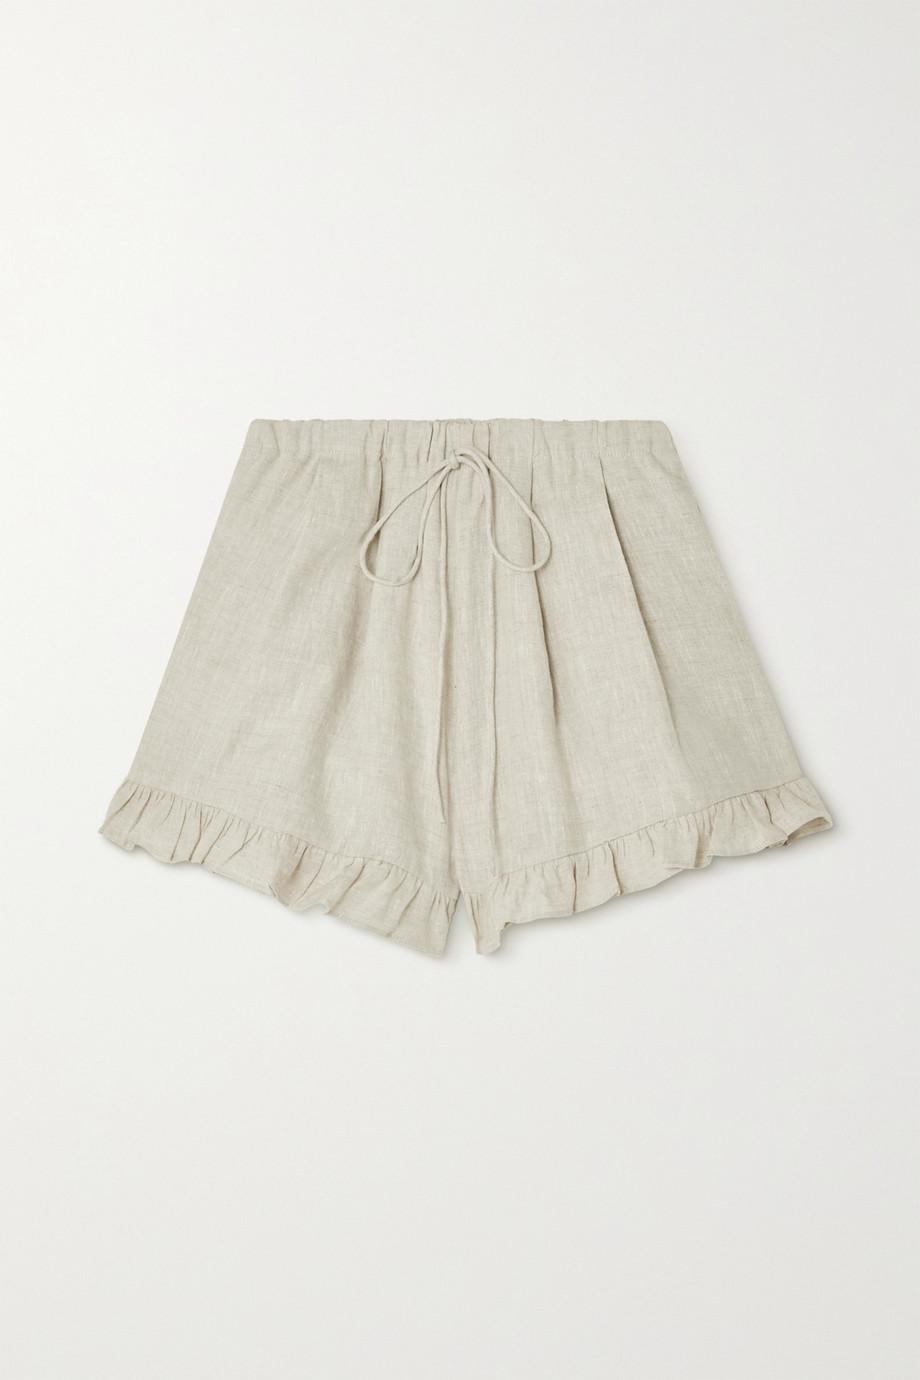 Joslin + NET SUSTAIN Gracie ruffled linen shorts